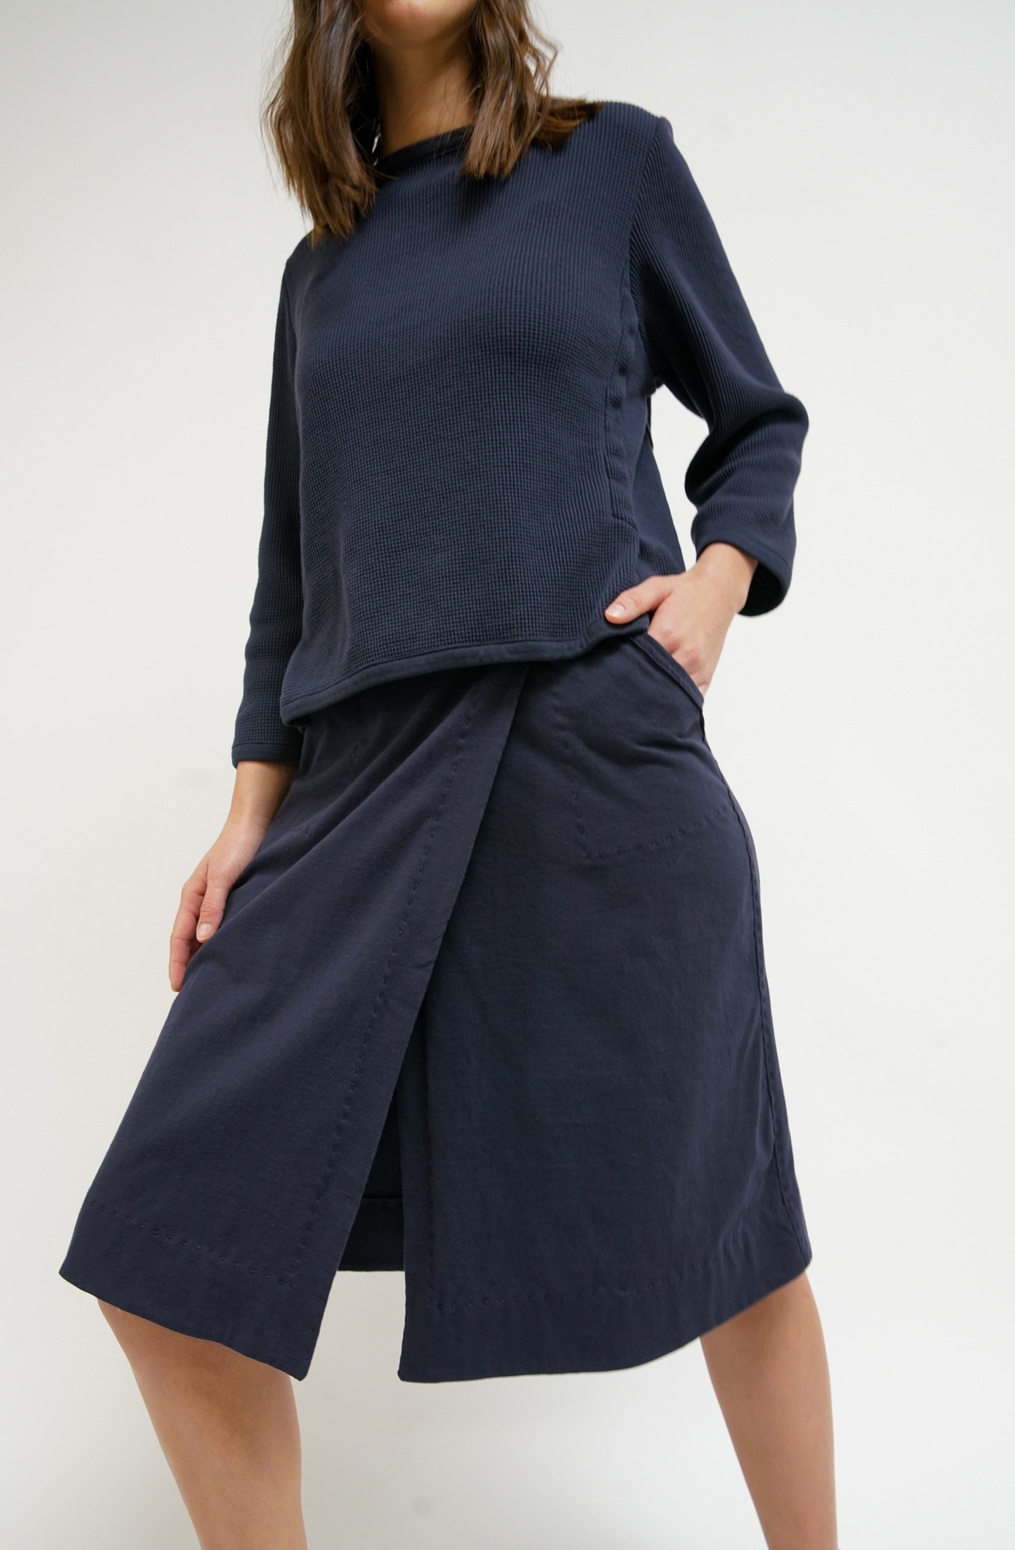 Alabama chanin everyday wrap skirt1